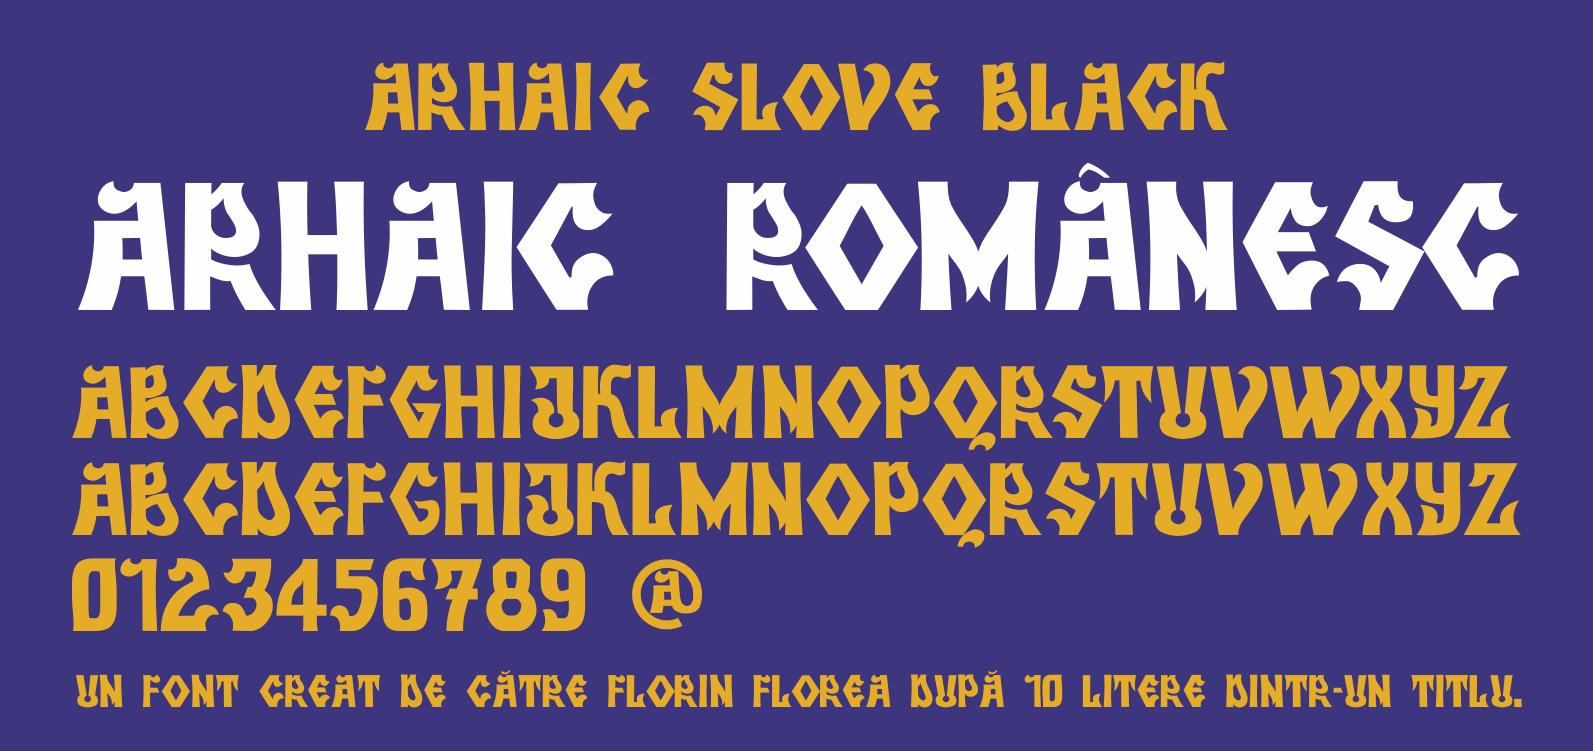 Font Arhaic slove Black